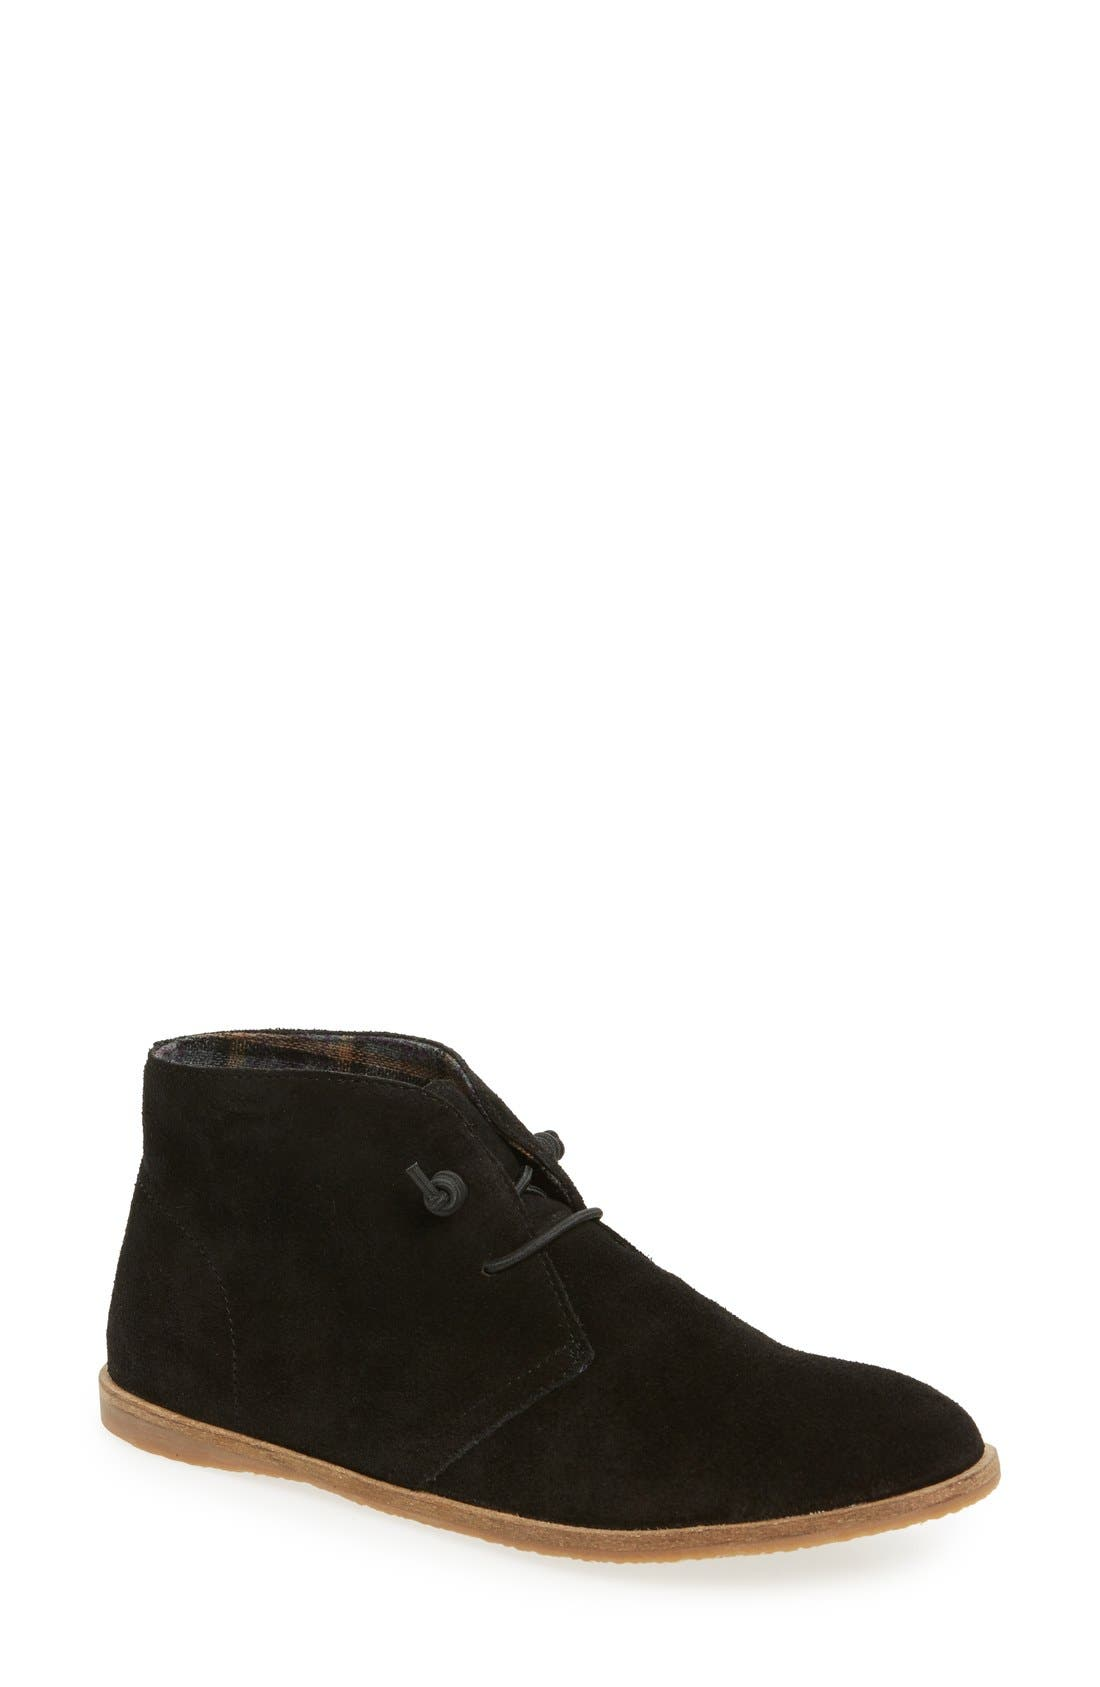 Alternate Image 1 Selected - Lucky Brand 'Ashbee' Chukka Boot (Women)